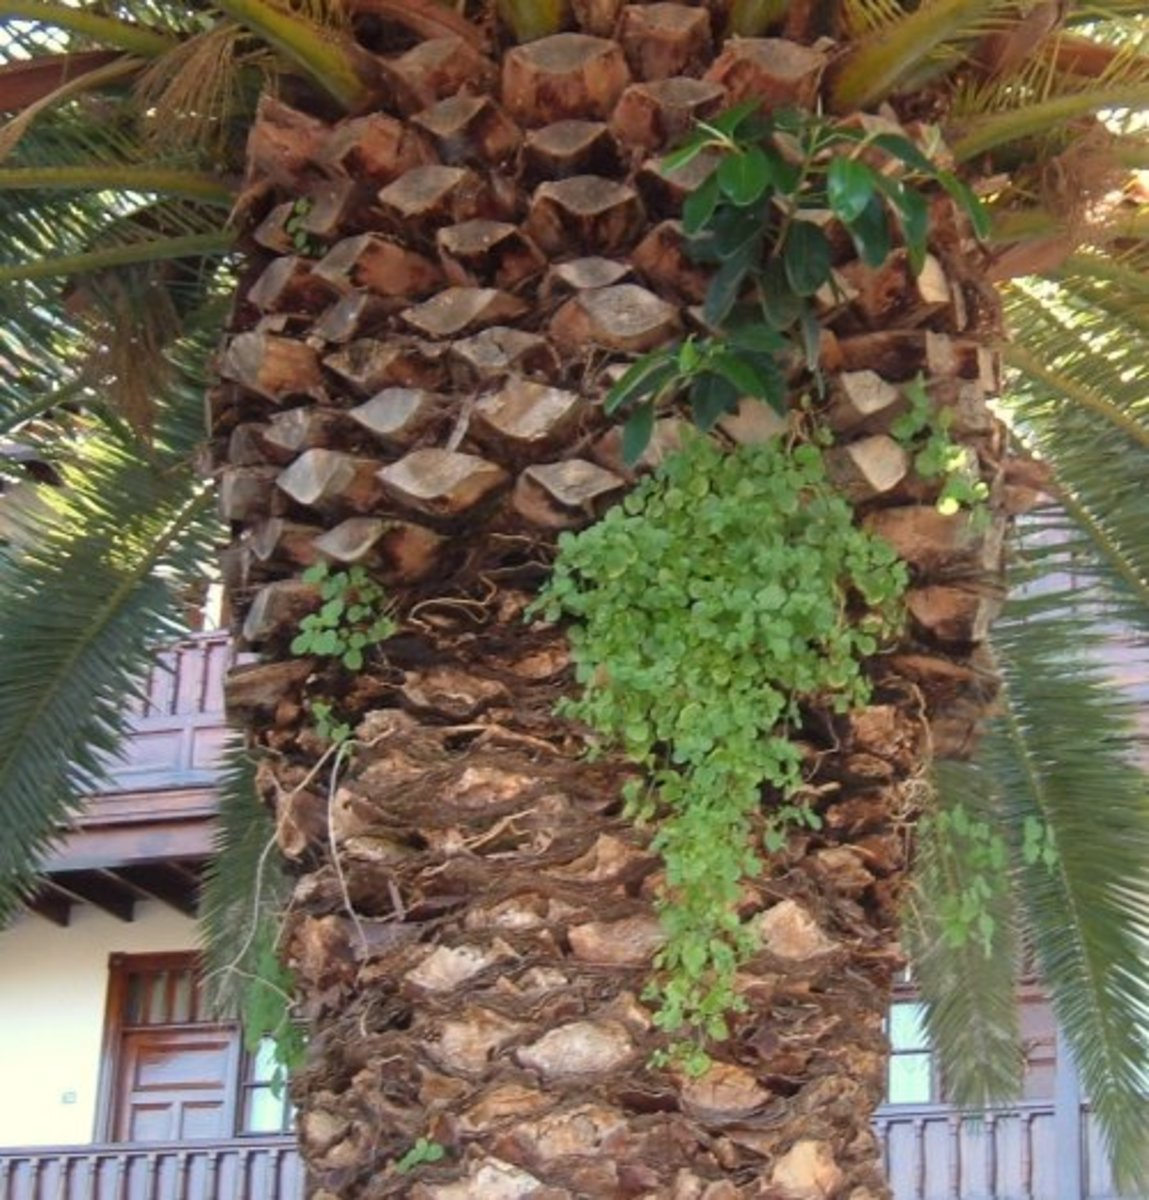 Epiphytes on a palm